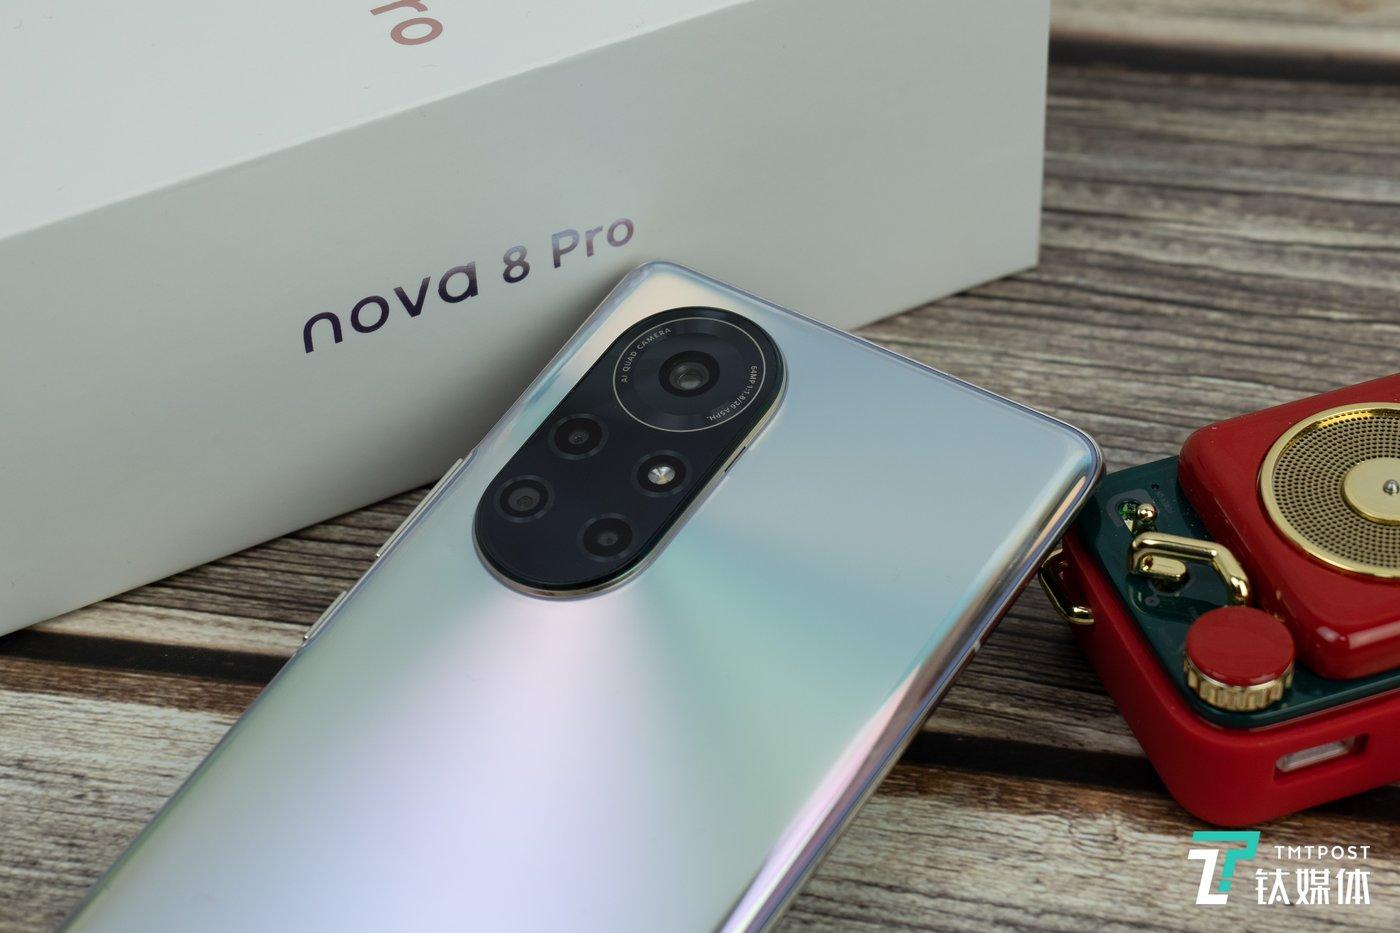 nova8 Pro摄像头模组